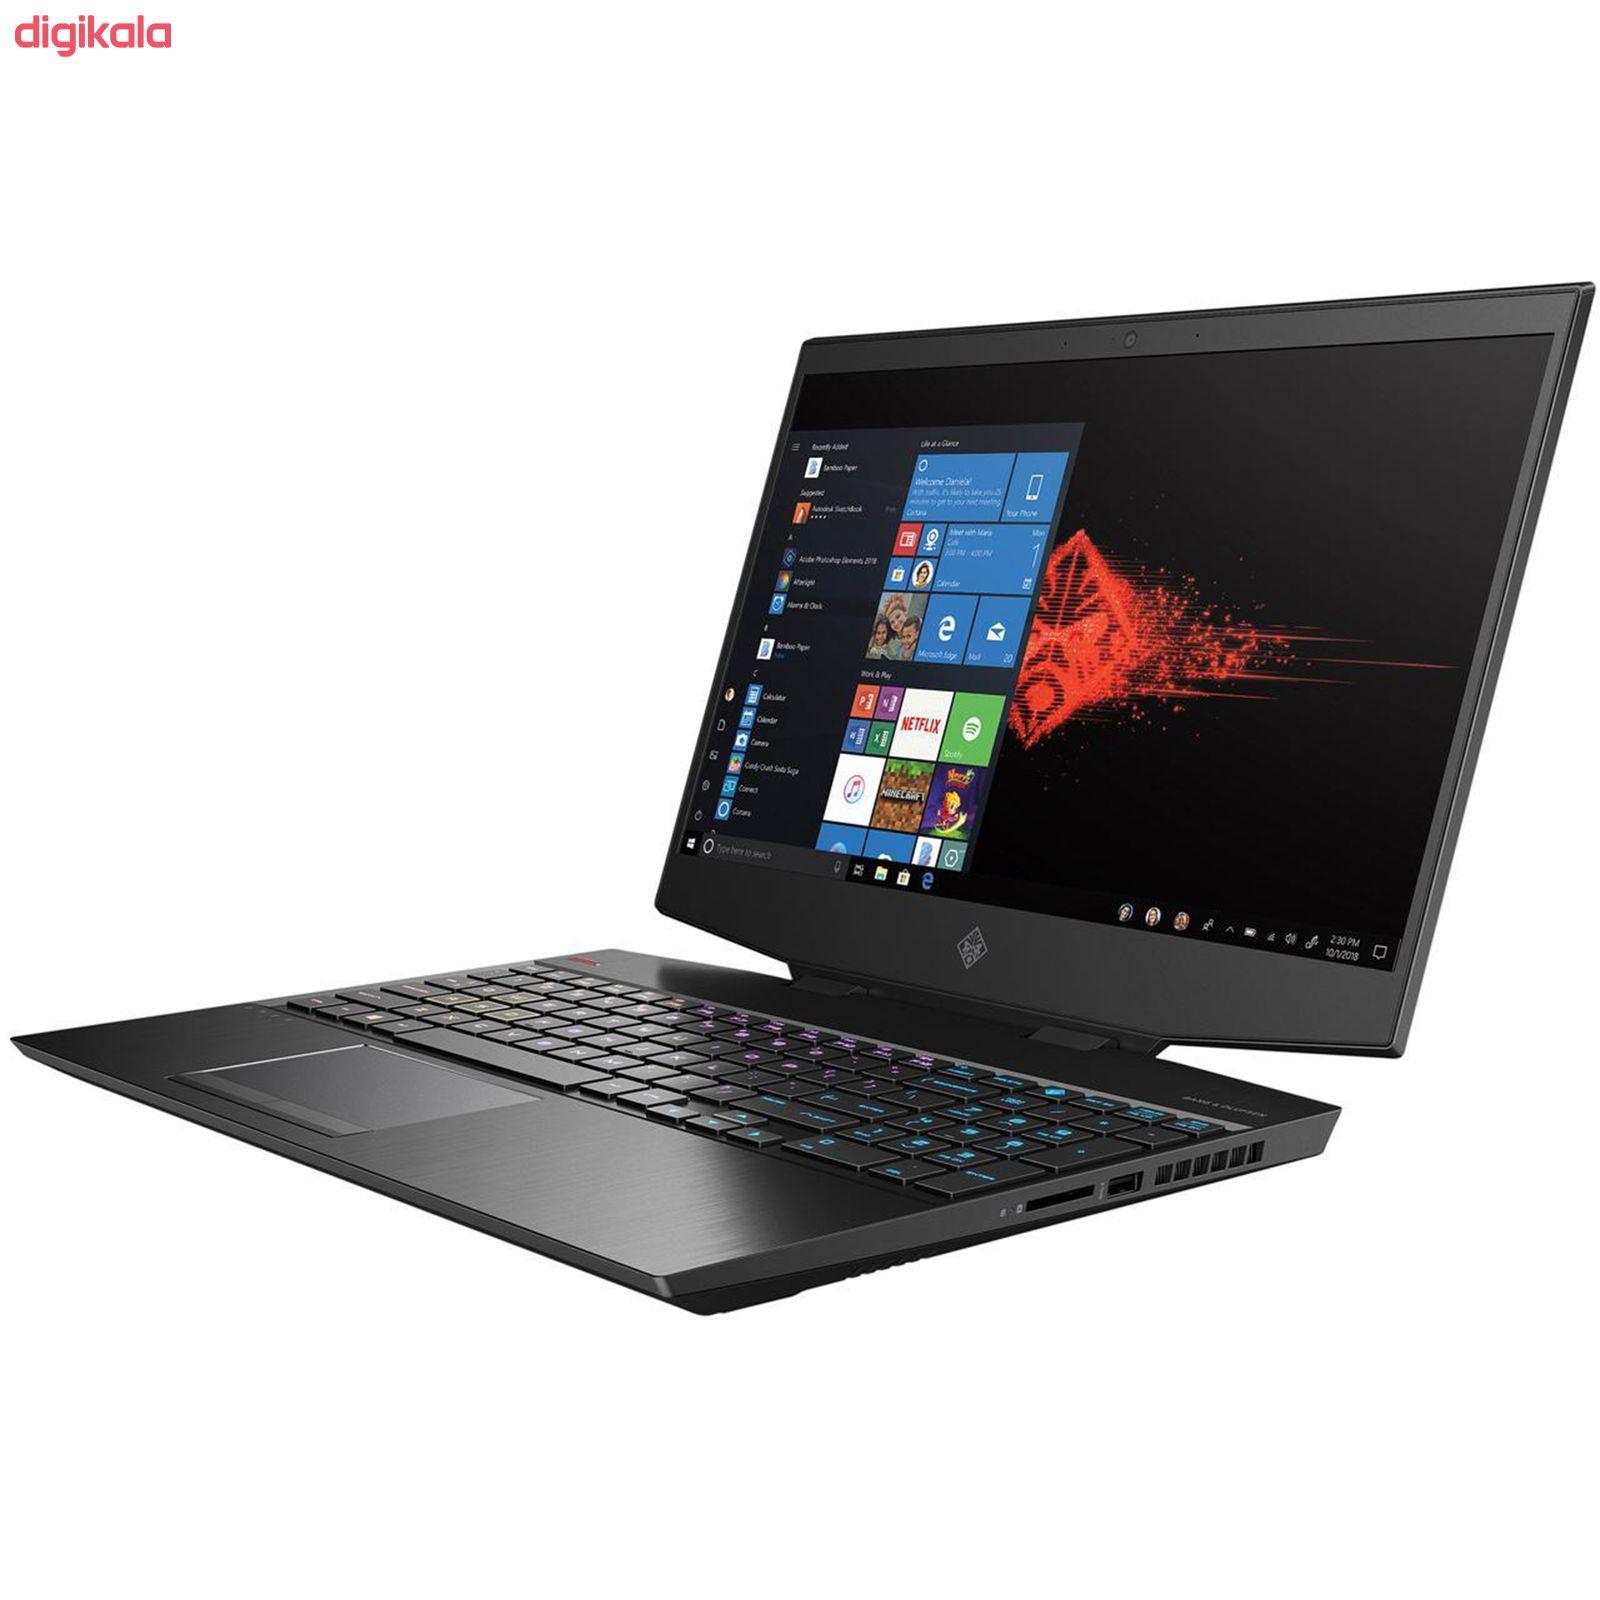 لپ تاپ 15.6 اینچی اچپی مدل OMEN 15-DH1050-C